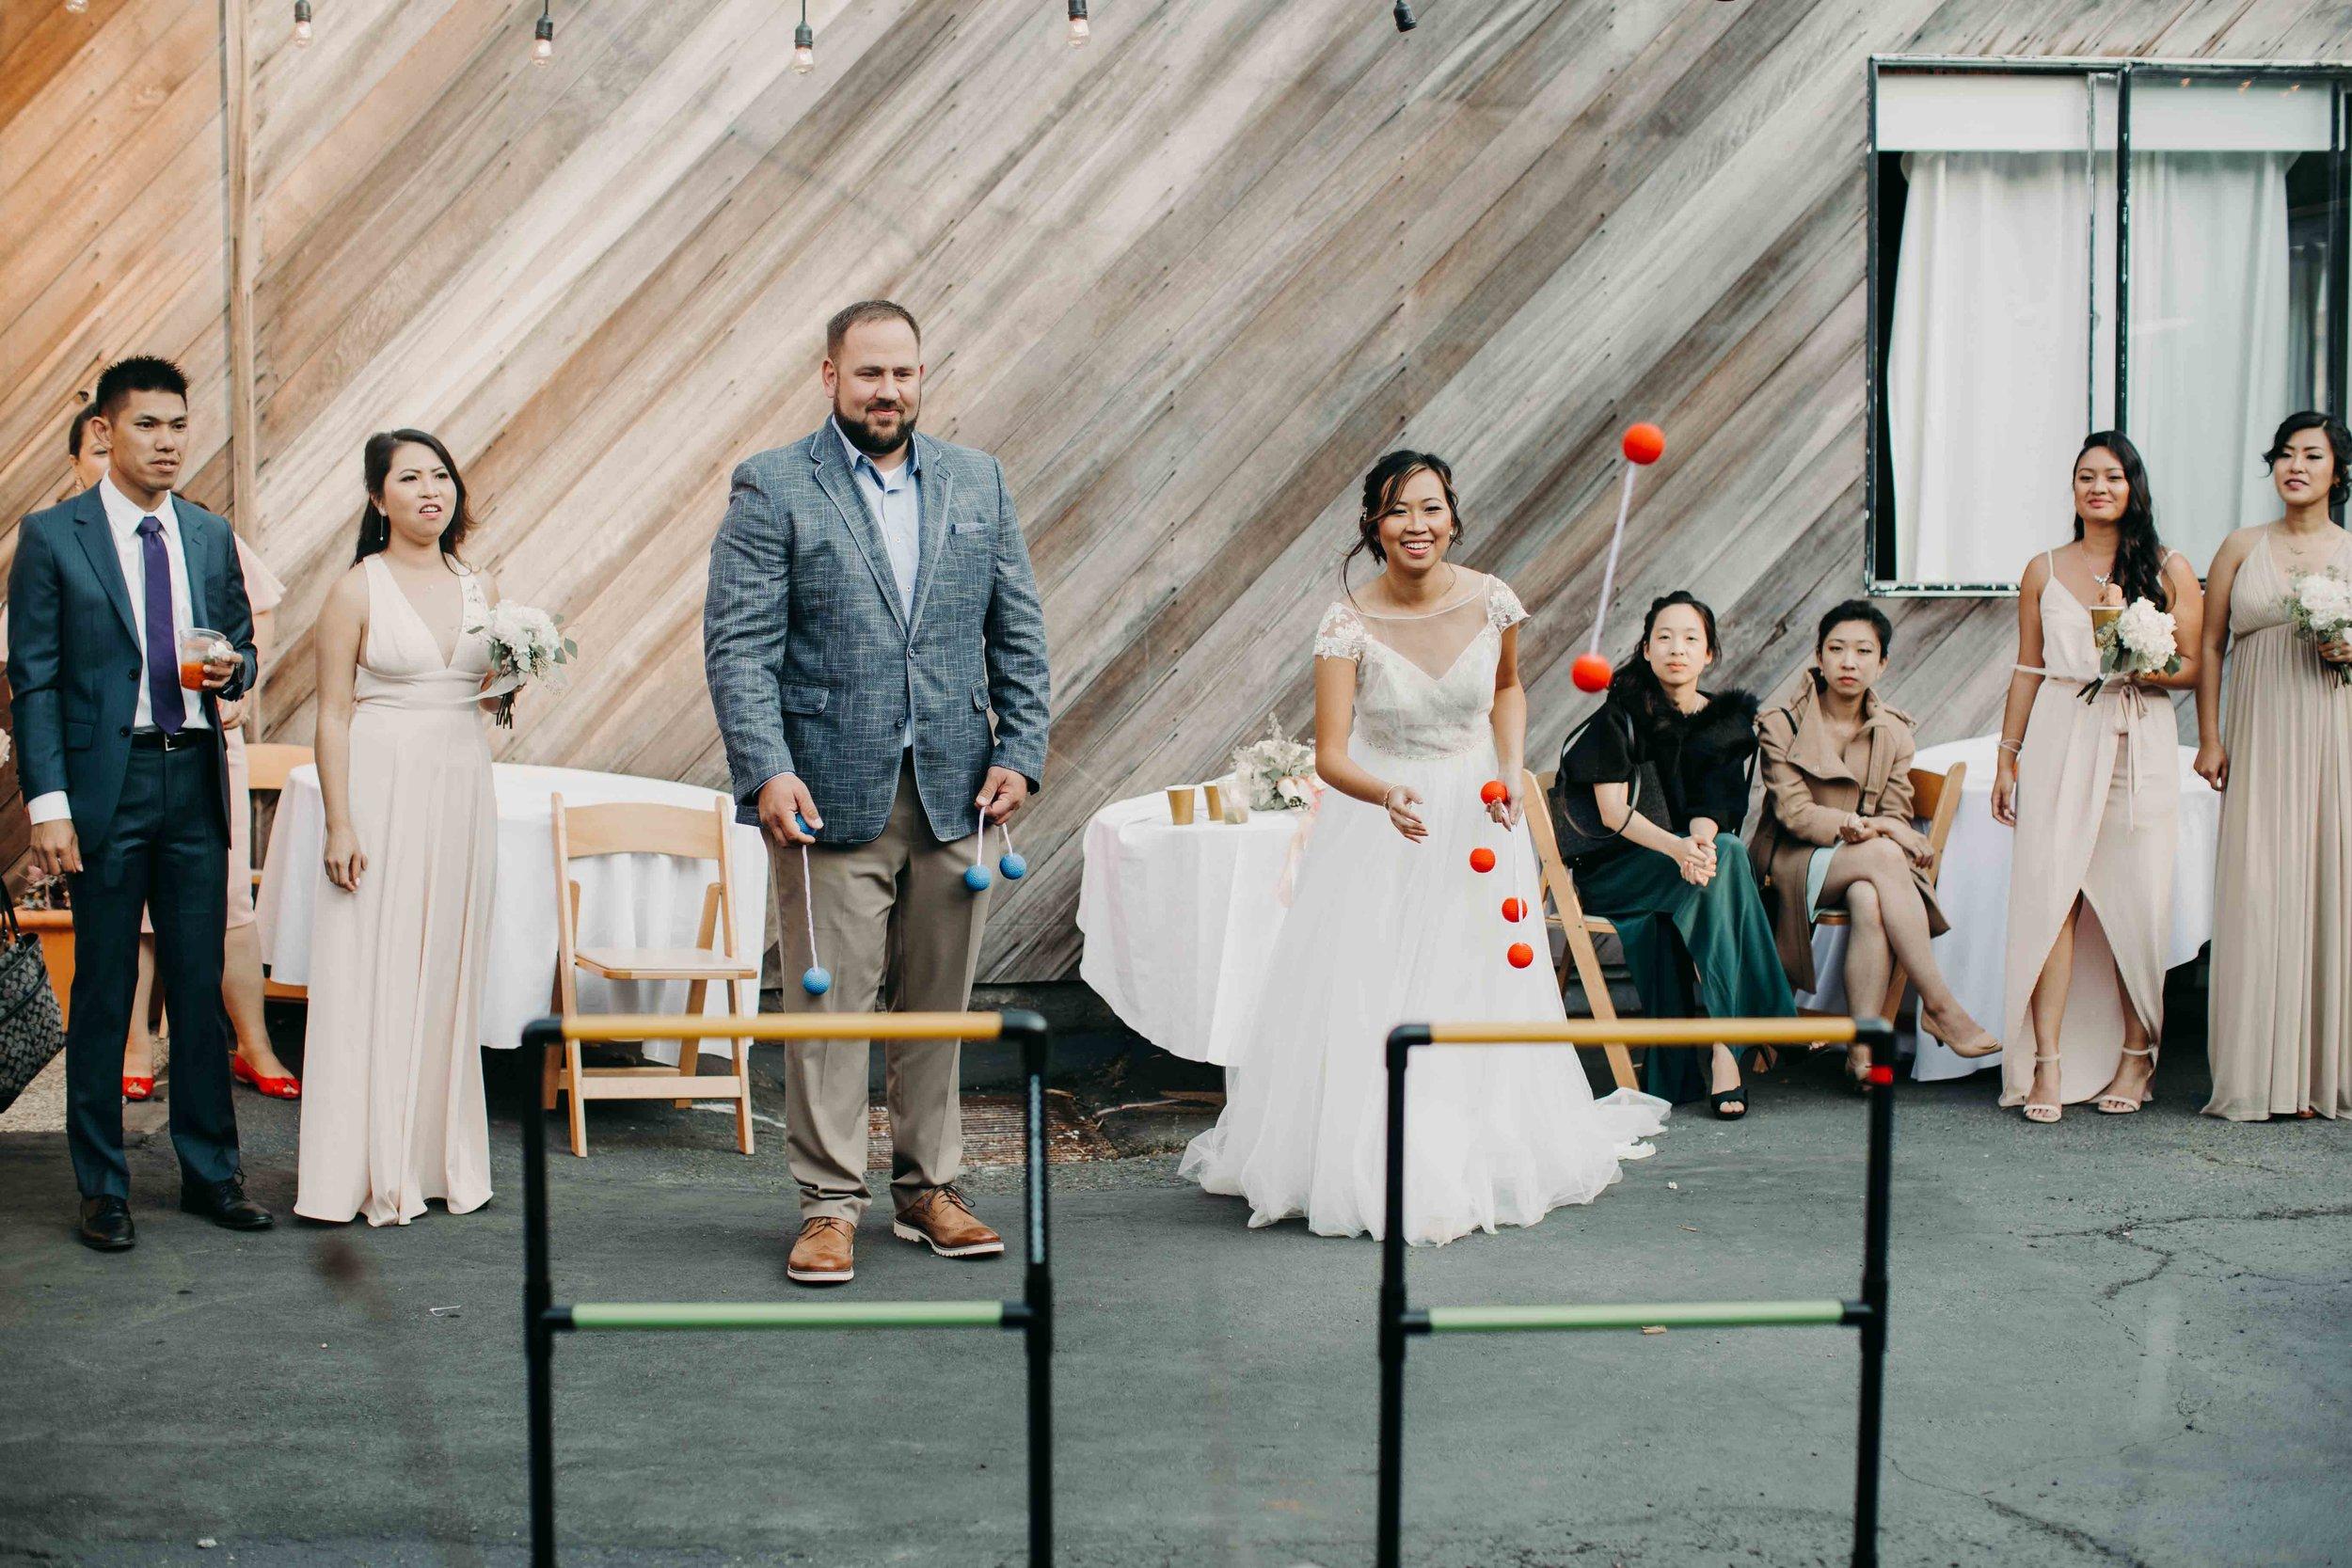 weddingday (49 of 67).jpg